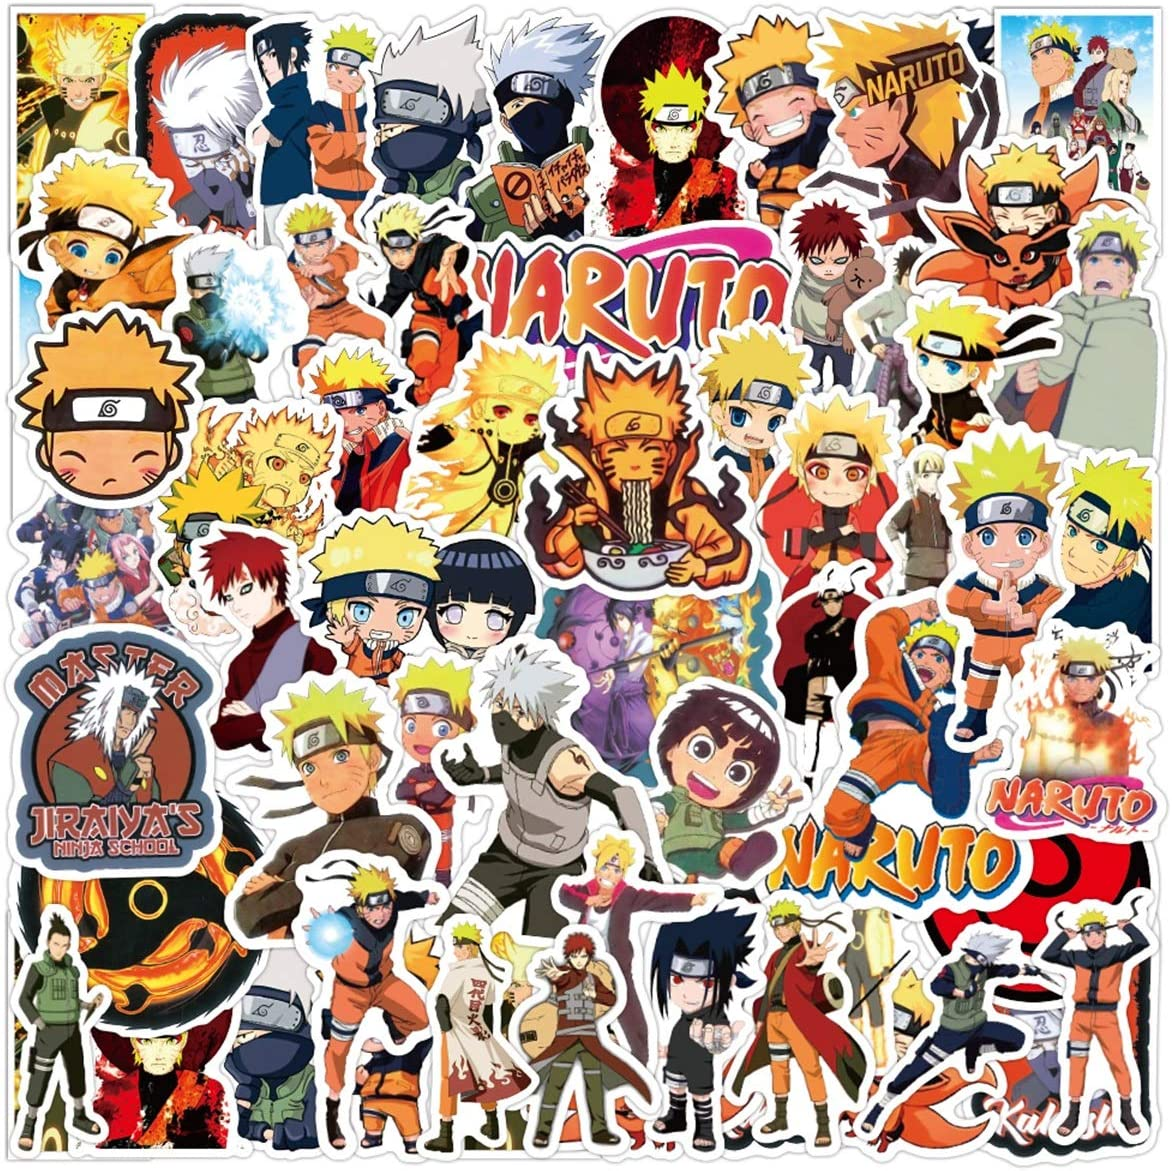 Naruto Stickers Japanese Uzumaki Sasuke Anime Stickers 50PCS Waterproof Vinyl Stickers for Laptop, Water Bottles, Skateboard, Phone, Scrapbook, Car, Guitar, Kakashi Computer Decals Graffiti Patches